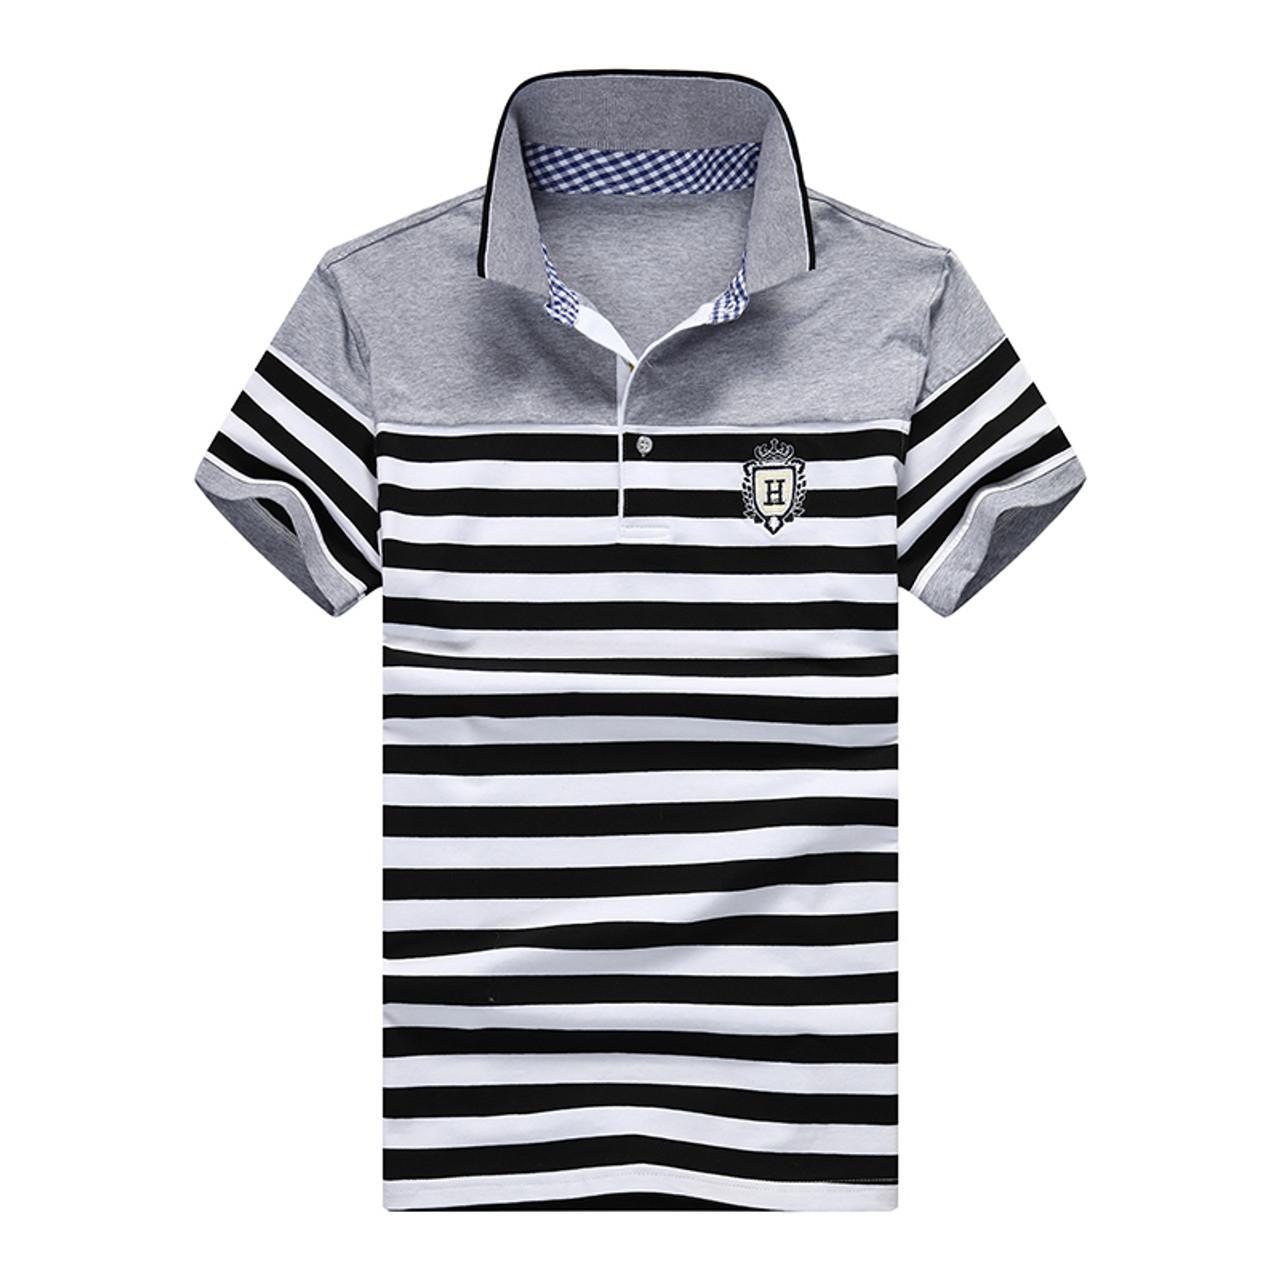 2464ba2a8 ... New 2018 Summer Fashion Turn-down Collar Cotton Striped Casual t shirt  Men Slim Fit ...